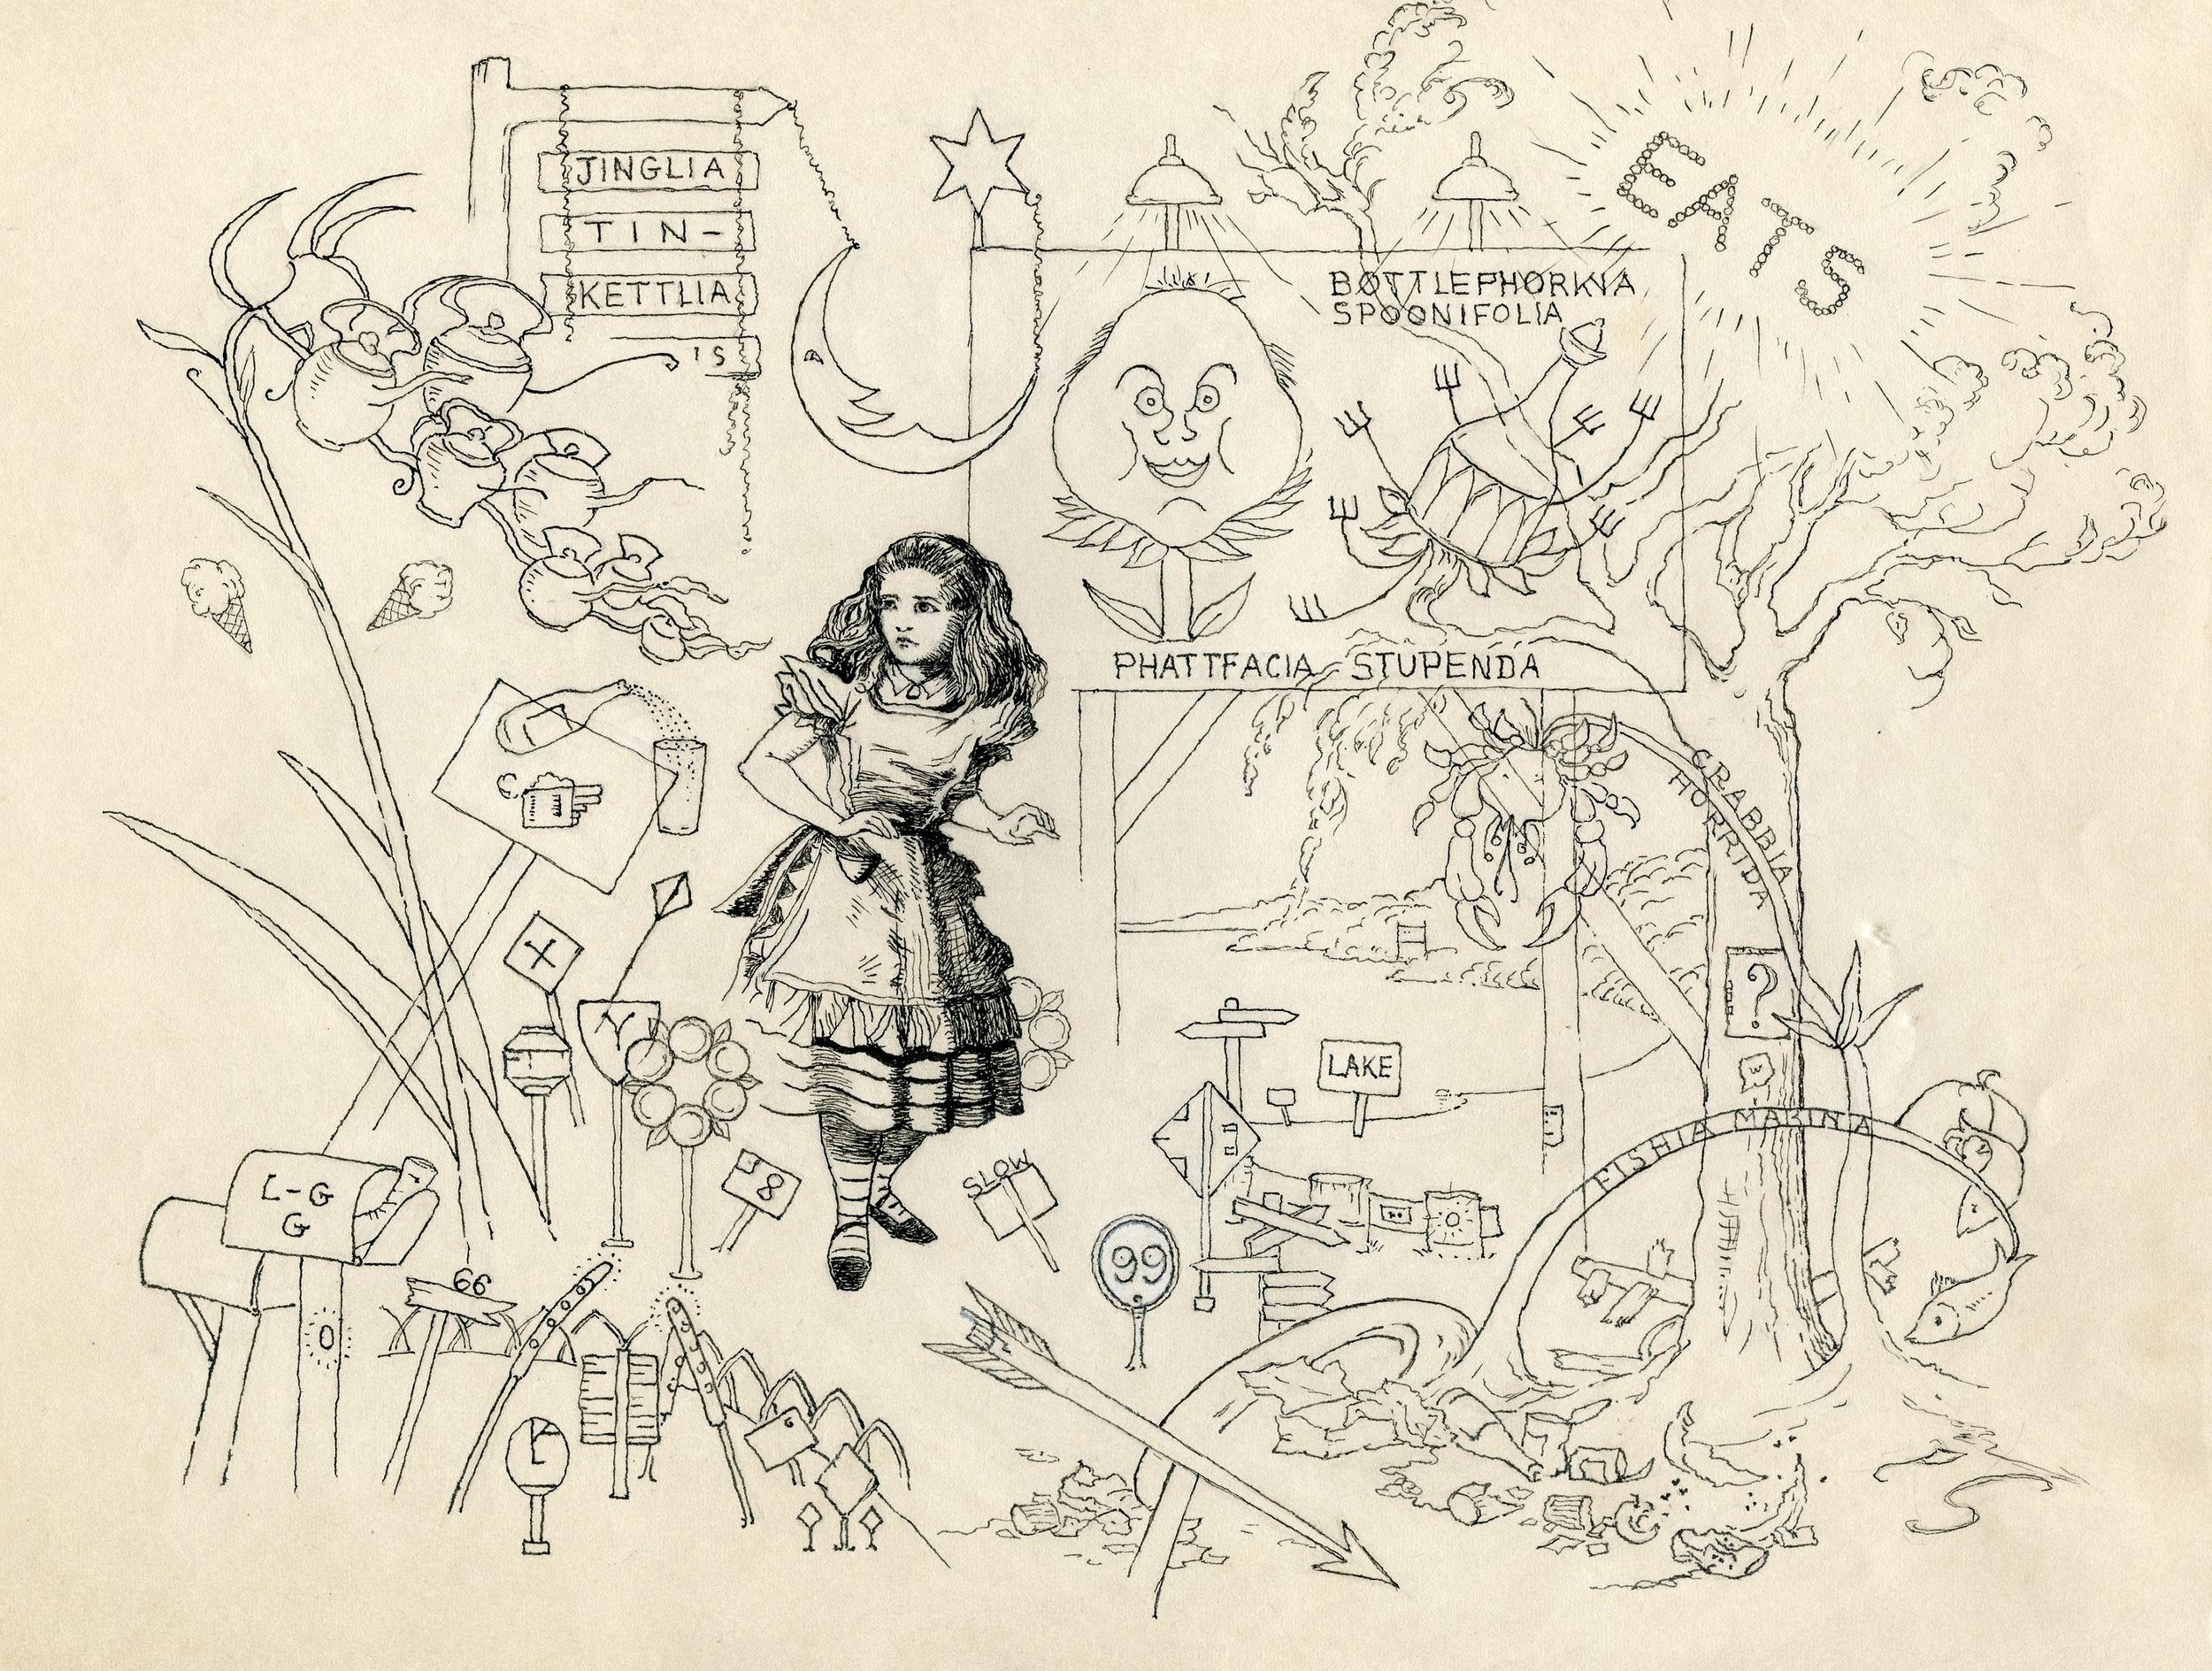 MSB, Twentieth Century Alice, c. 1940's.